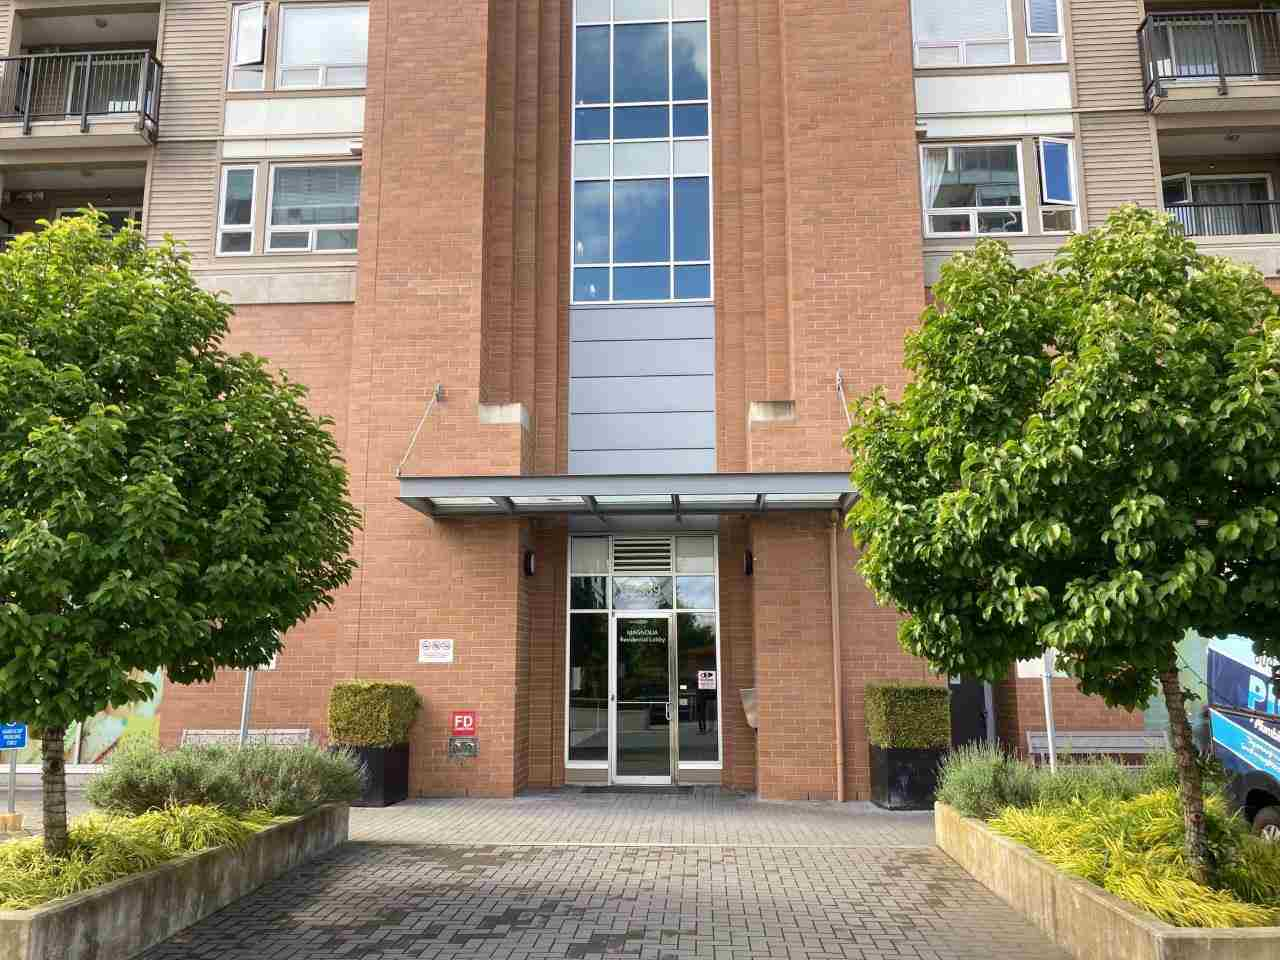 210 12339 STEVESTON HIGHWAY - Ironwood Apartment/Condo for sale, 1 Bedroom (R2583214)